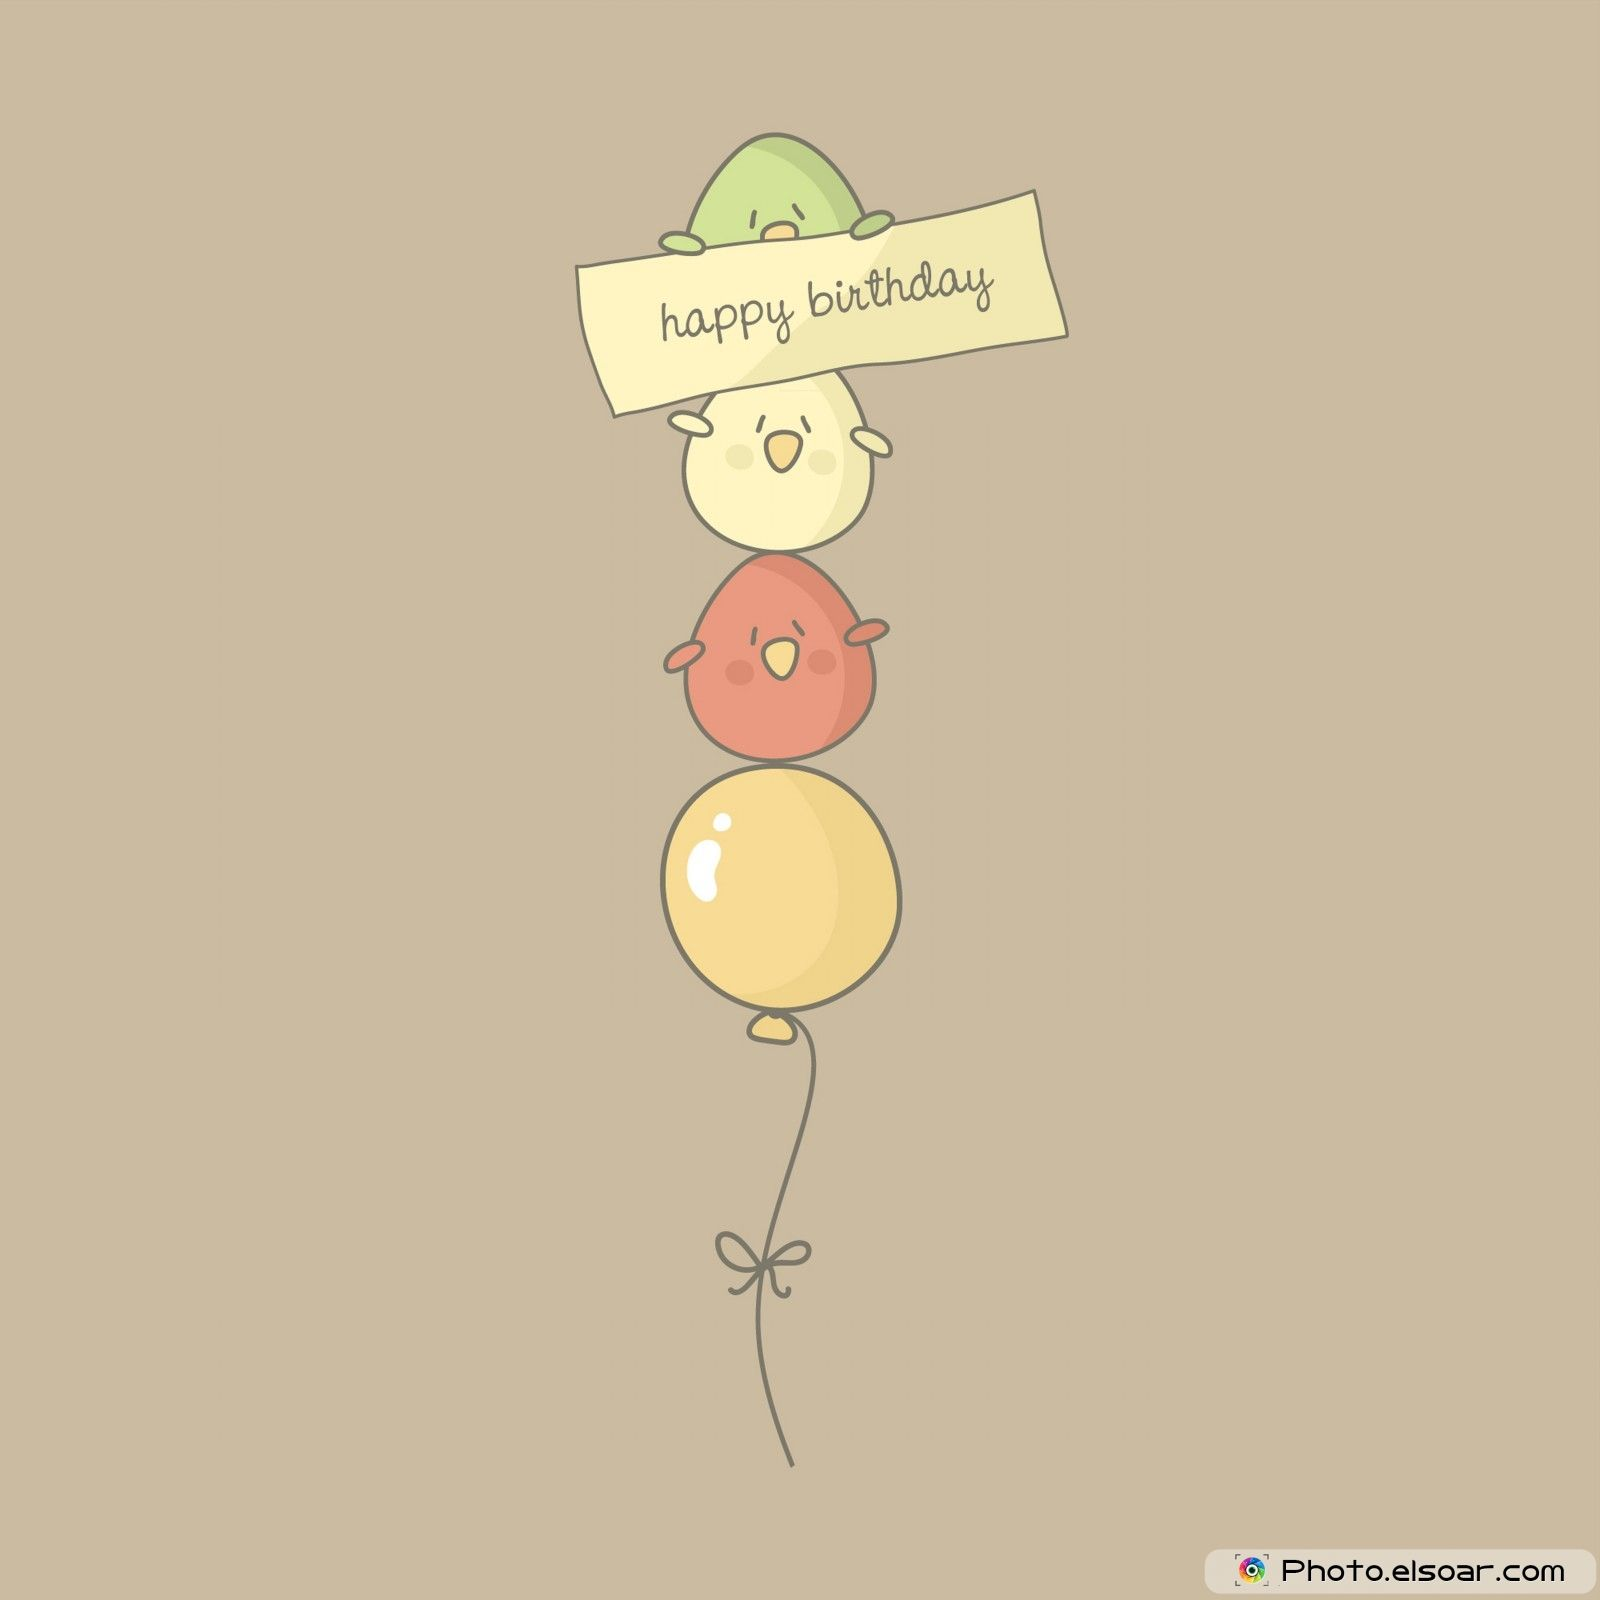 Birthday card with cute birds flying on a balloon – Happy Birthday Cards Cute